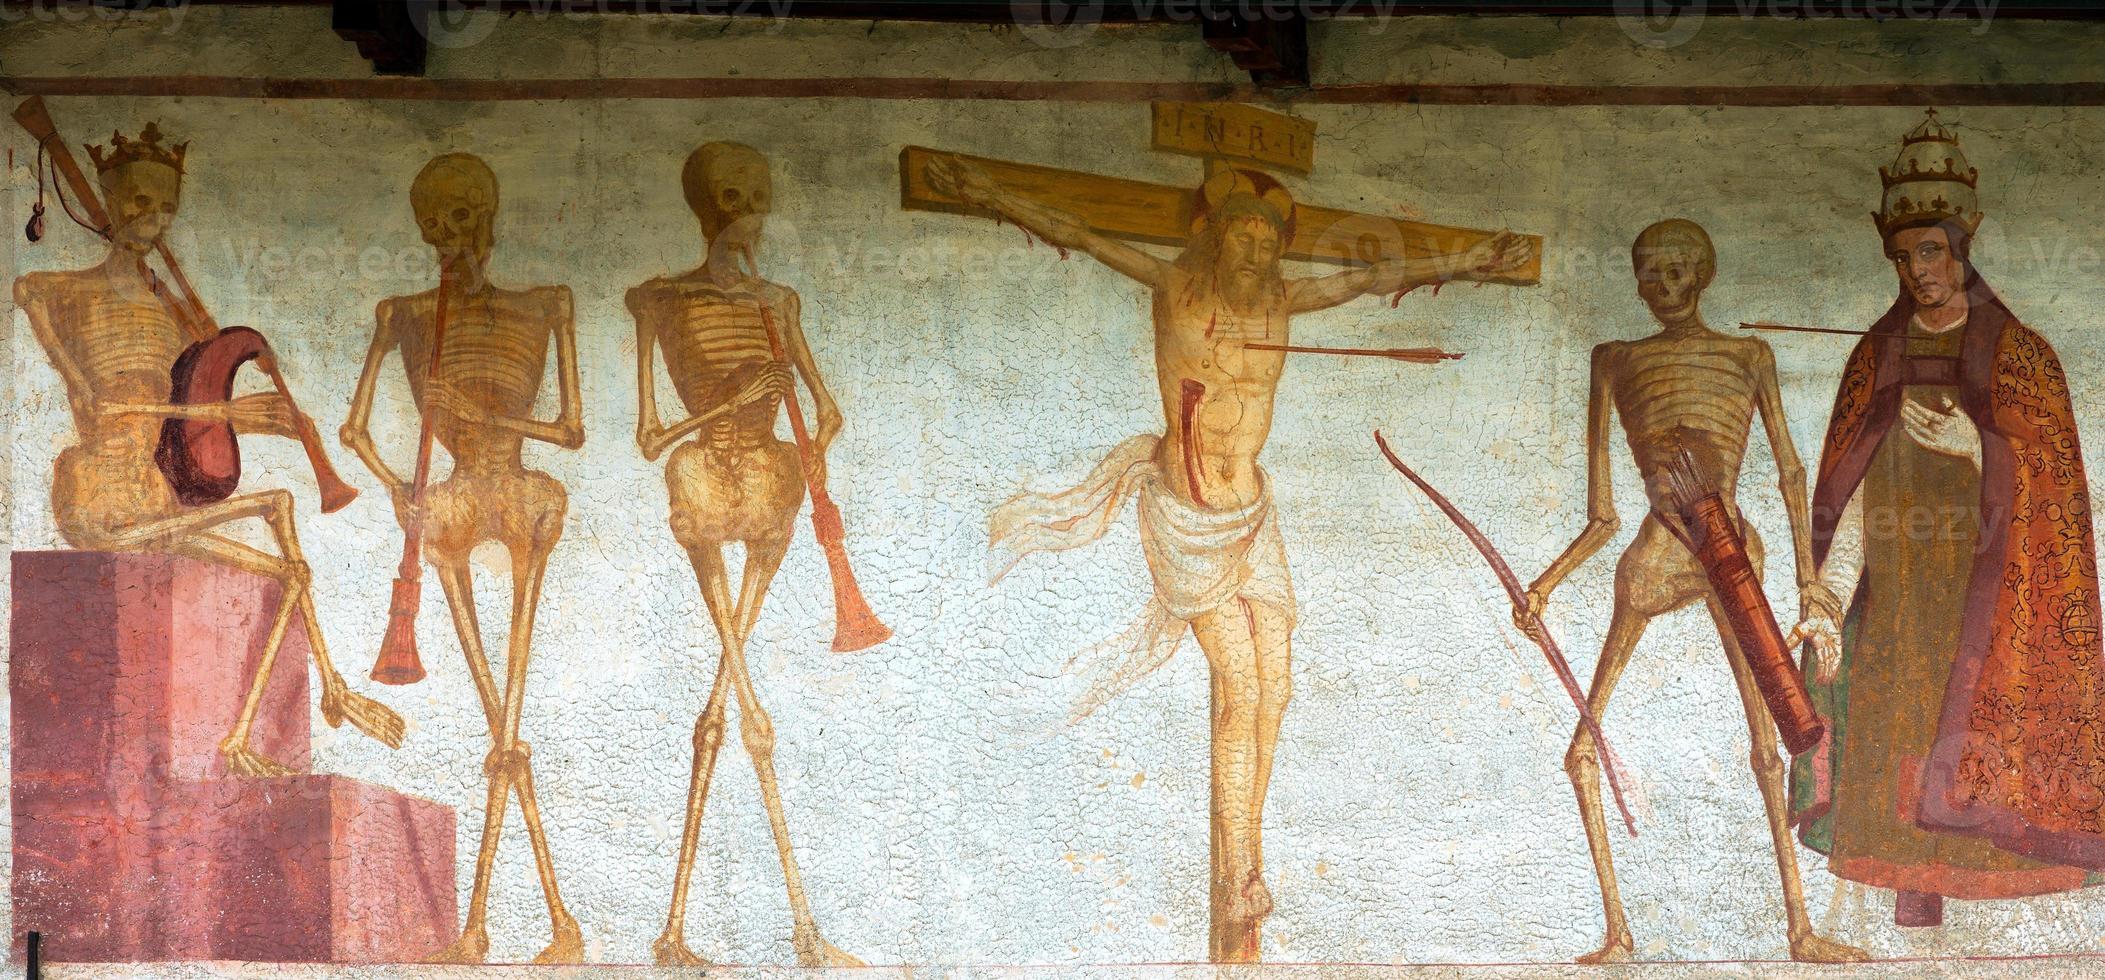 fresco makaber dans - pinzolo trento italy foto